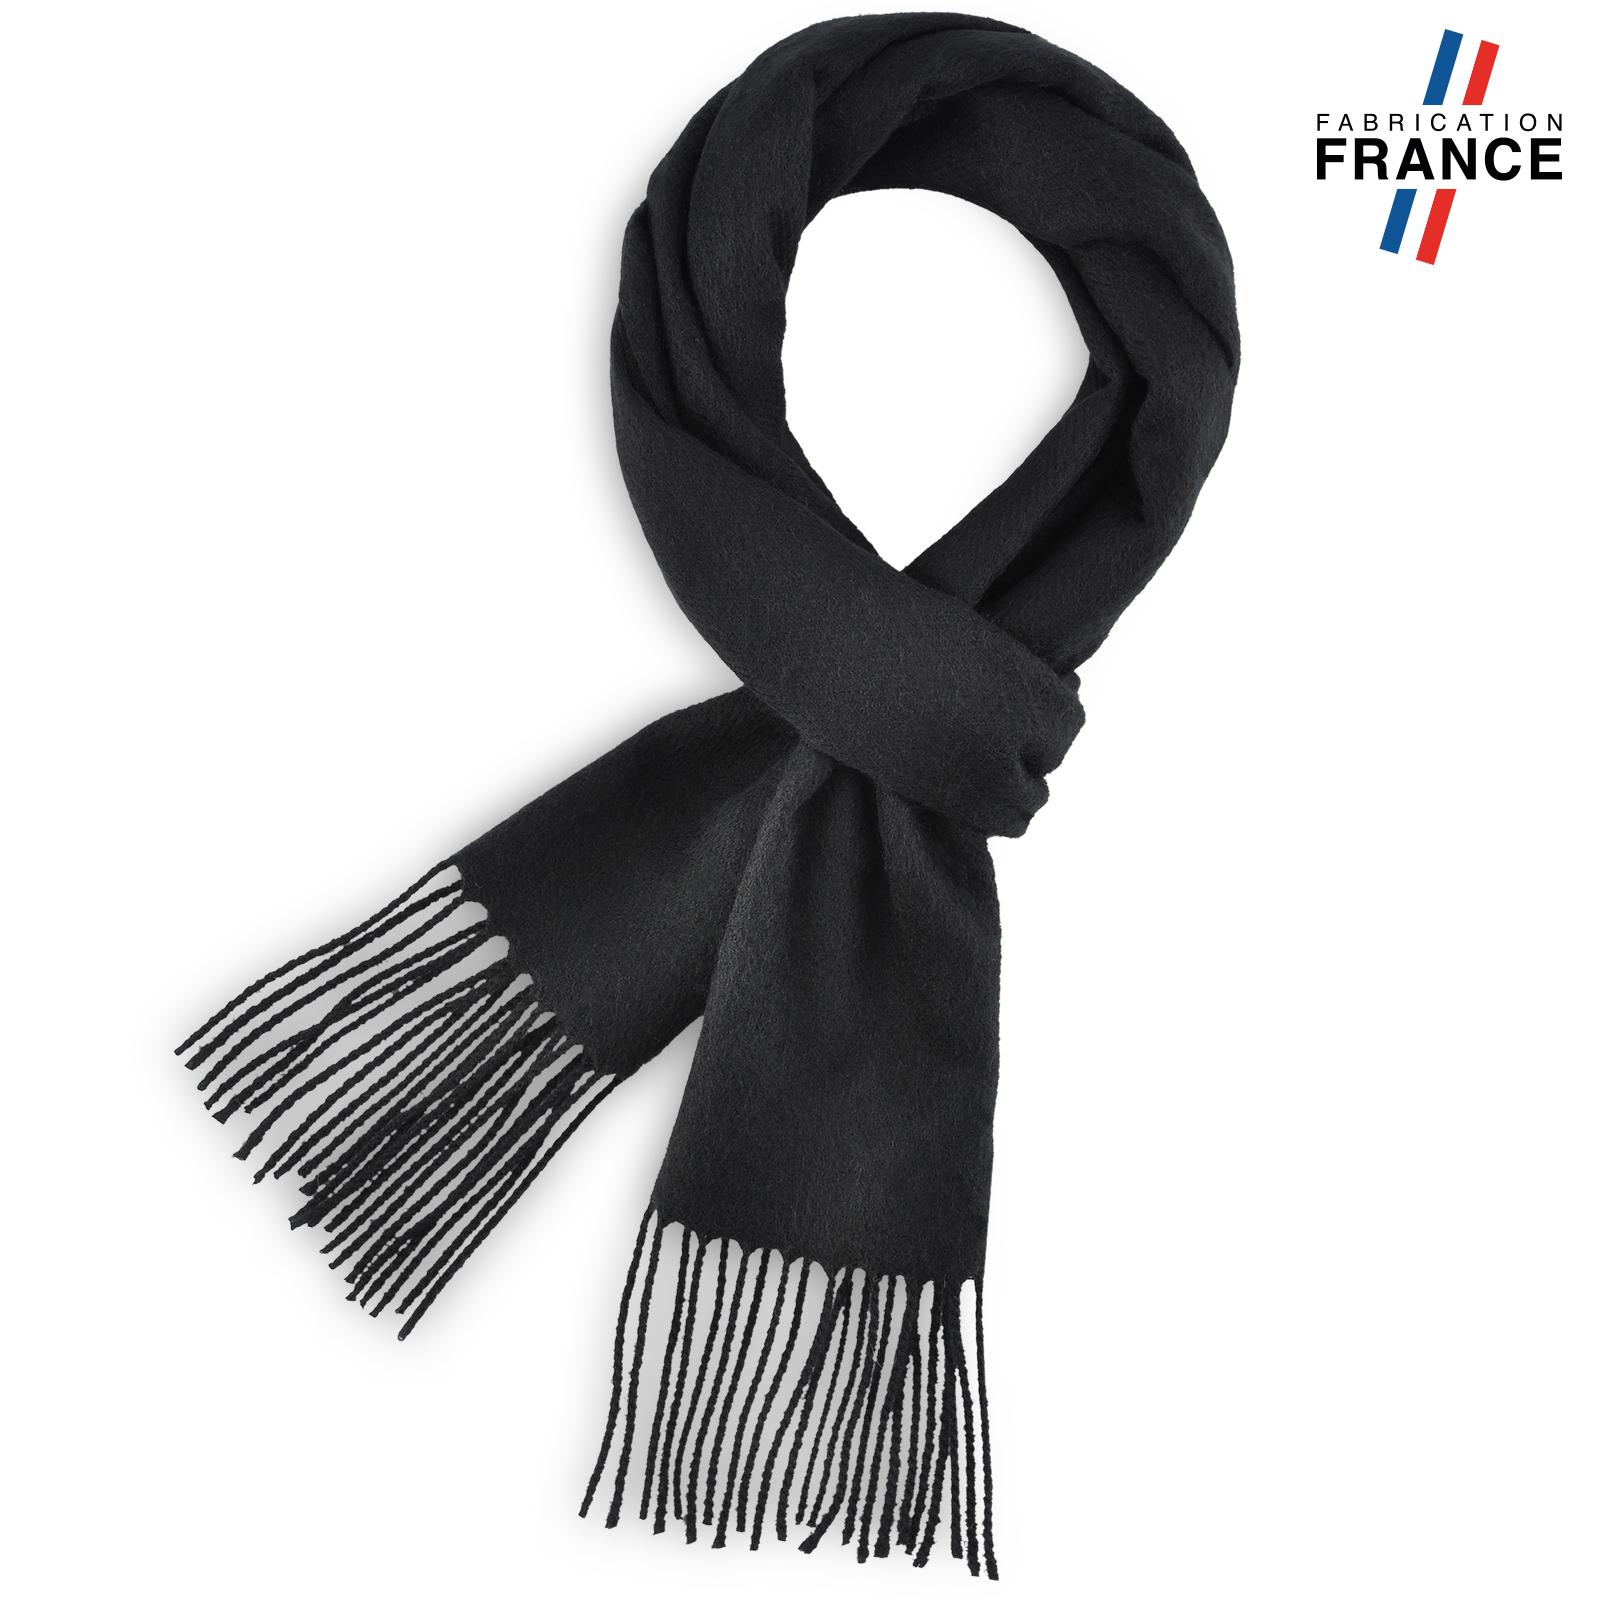 AT-03231-F16-echarpe-a-franges-noire-fabrication-francaise